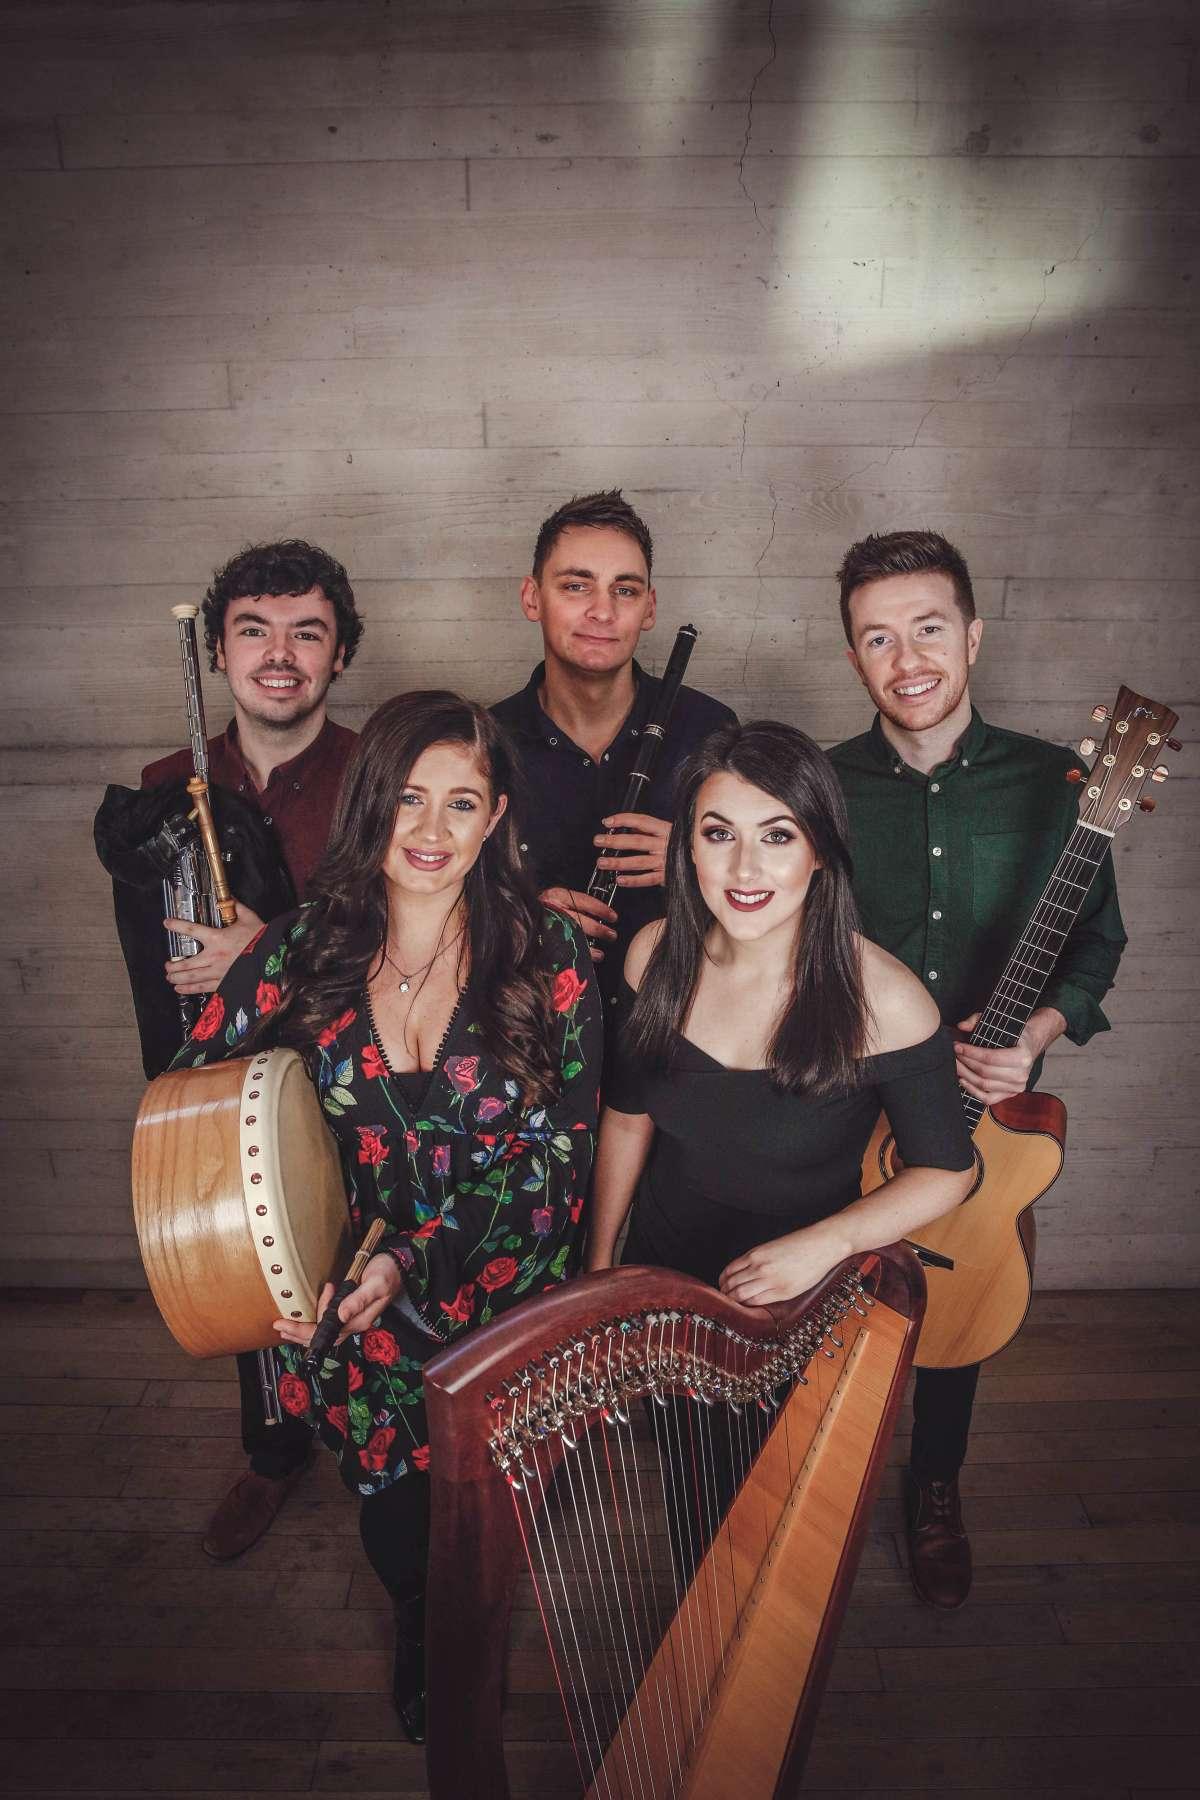 Irish Spring Festival - Niall Hanna & Stephen Loghran, David Munnelly Band feat. Anne Brennan, Connla, Aneta Dortová - Wandelhalle  - Bad Wildungen